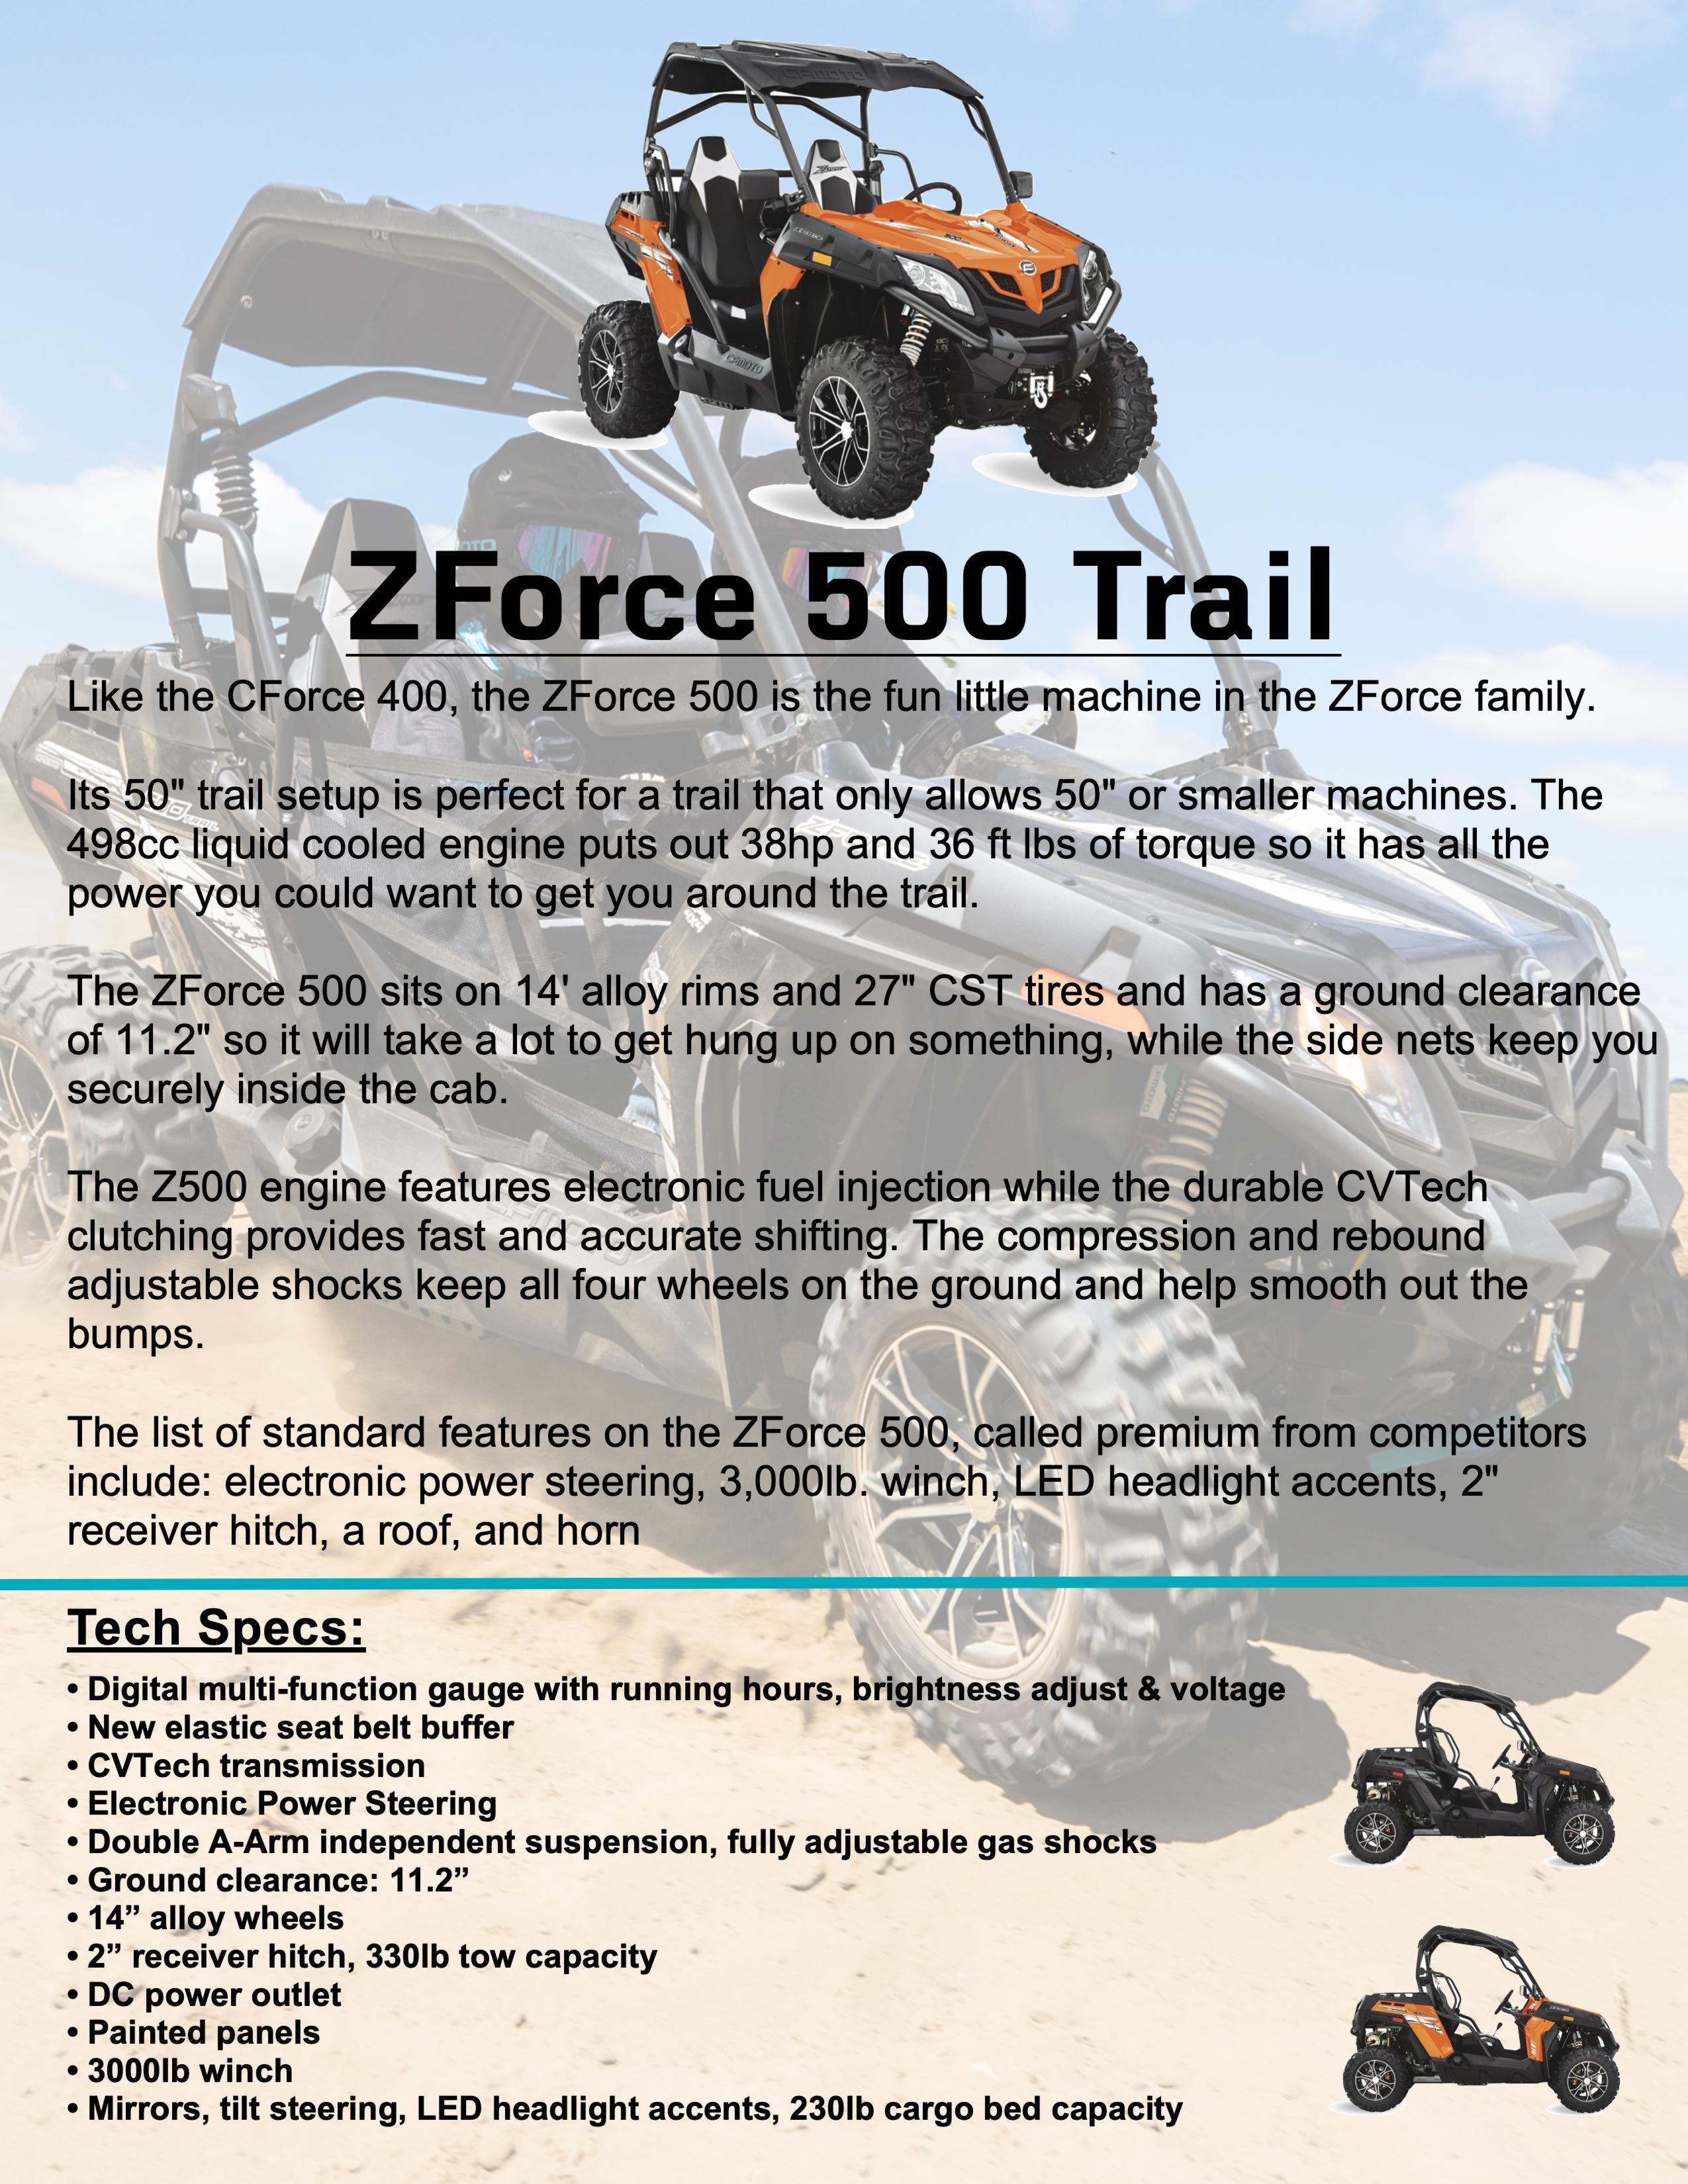 ZFORCE 500 TRAIL